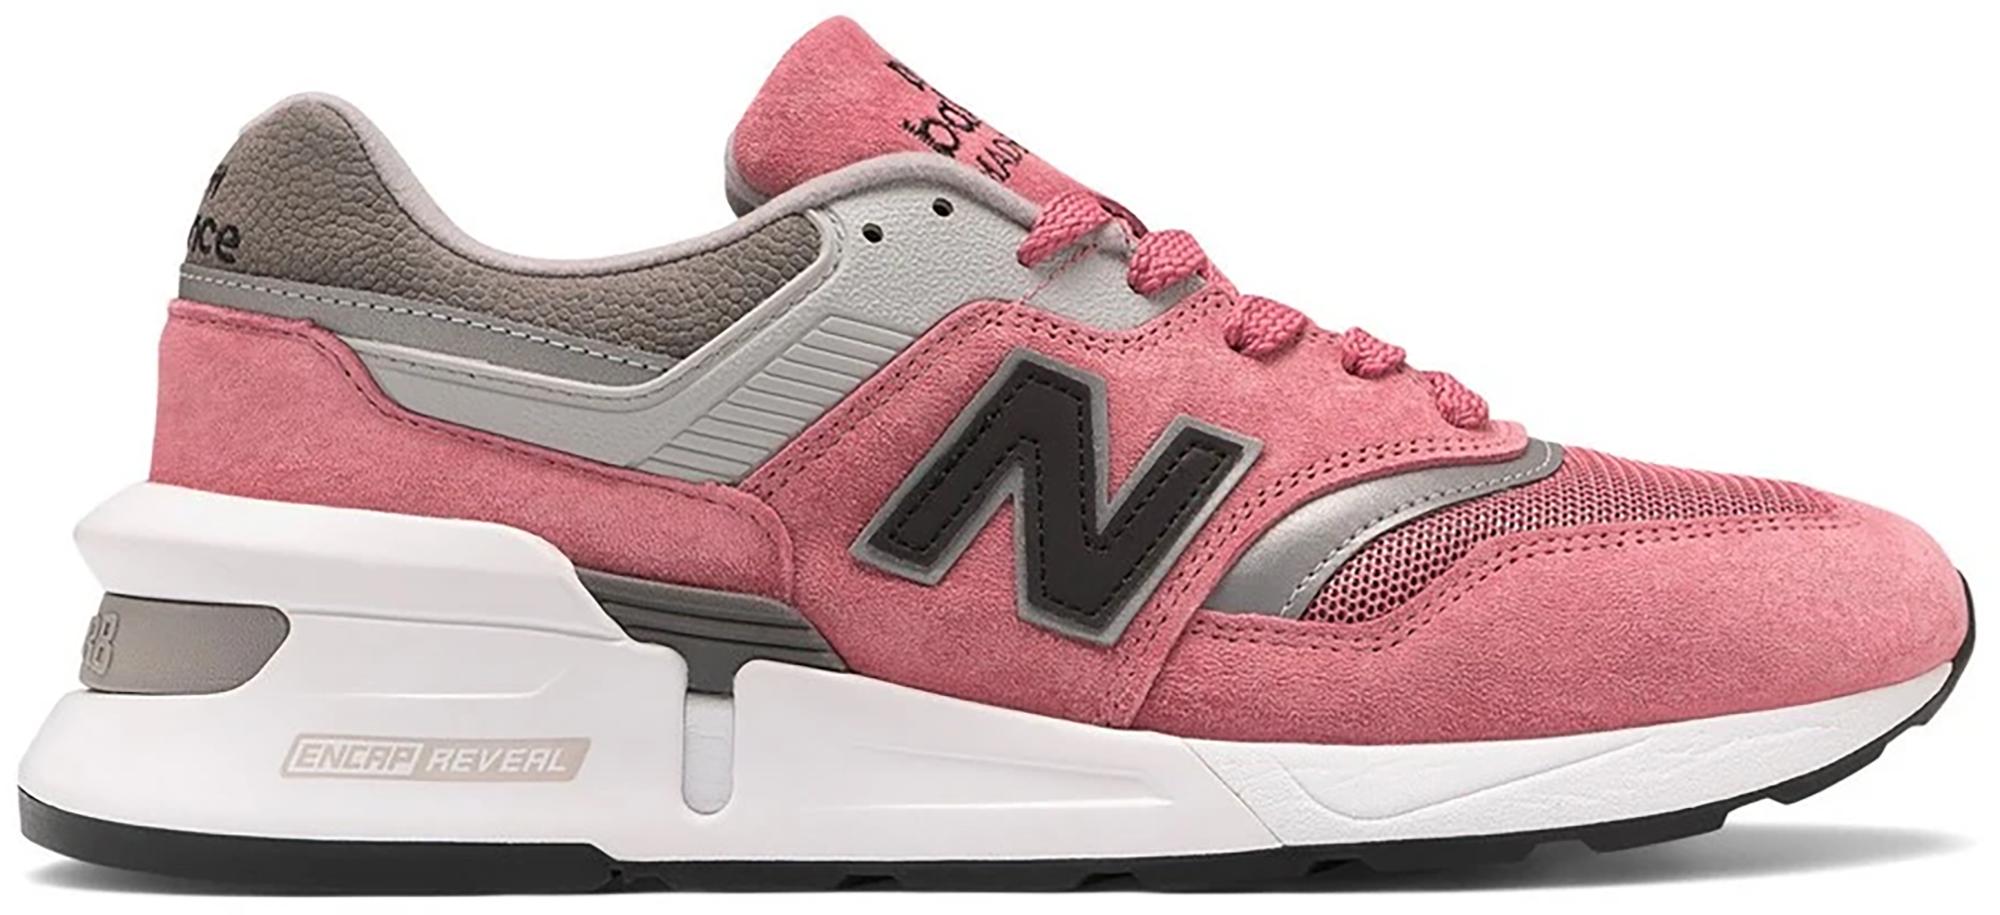 New Balance 997S Pink Grey - M997SPG